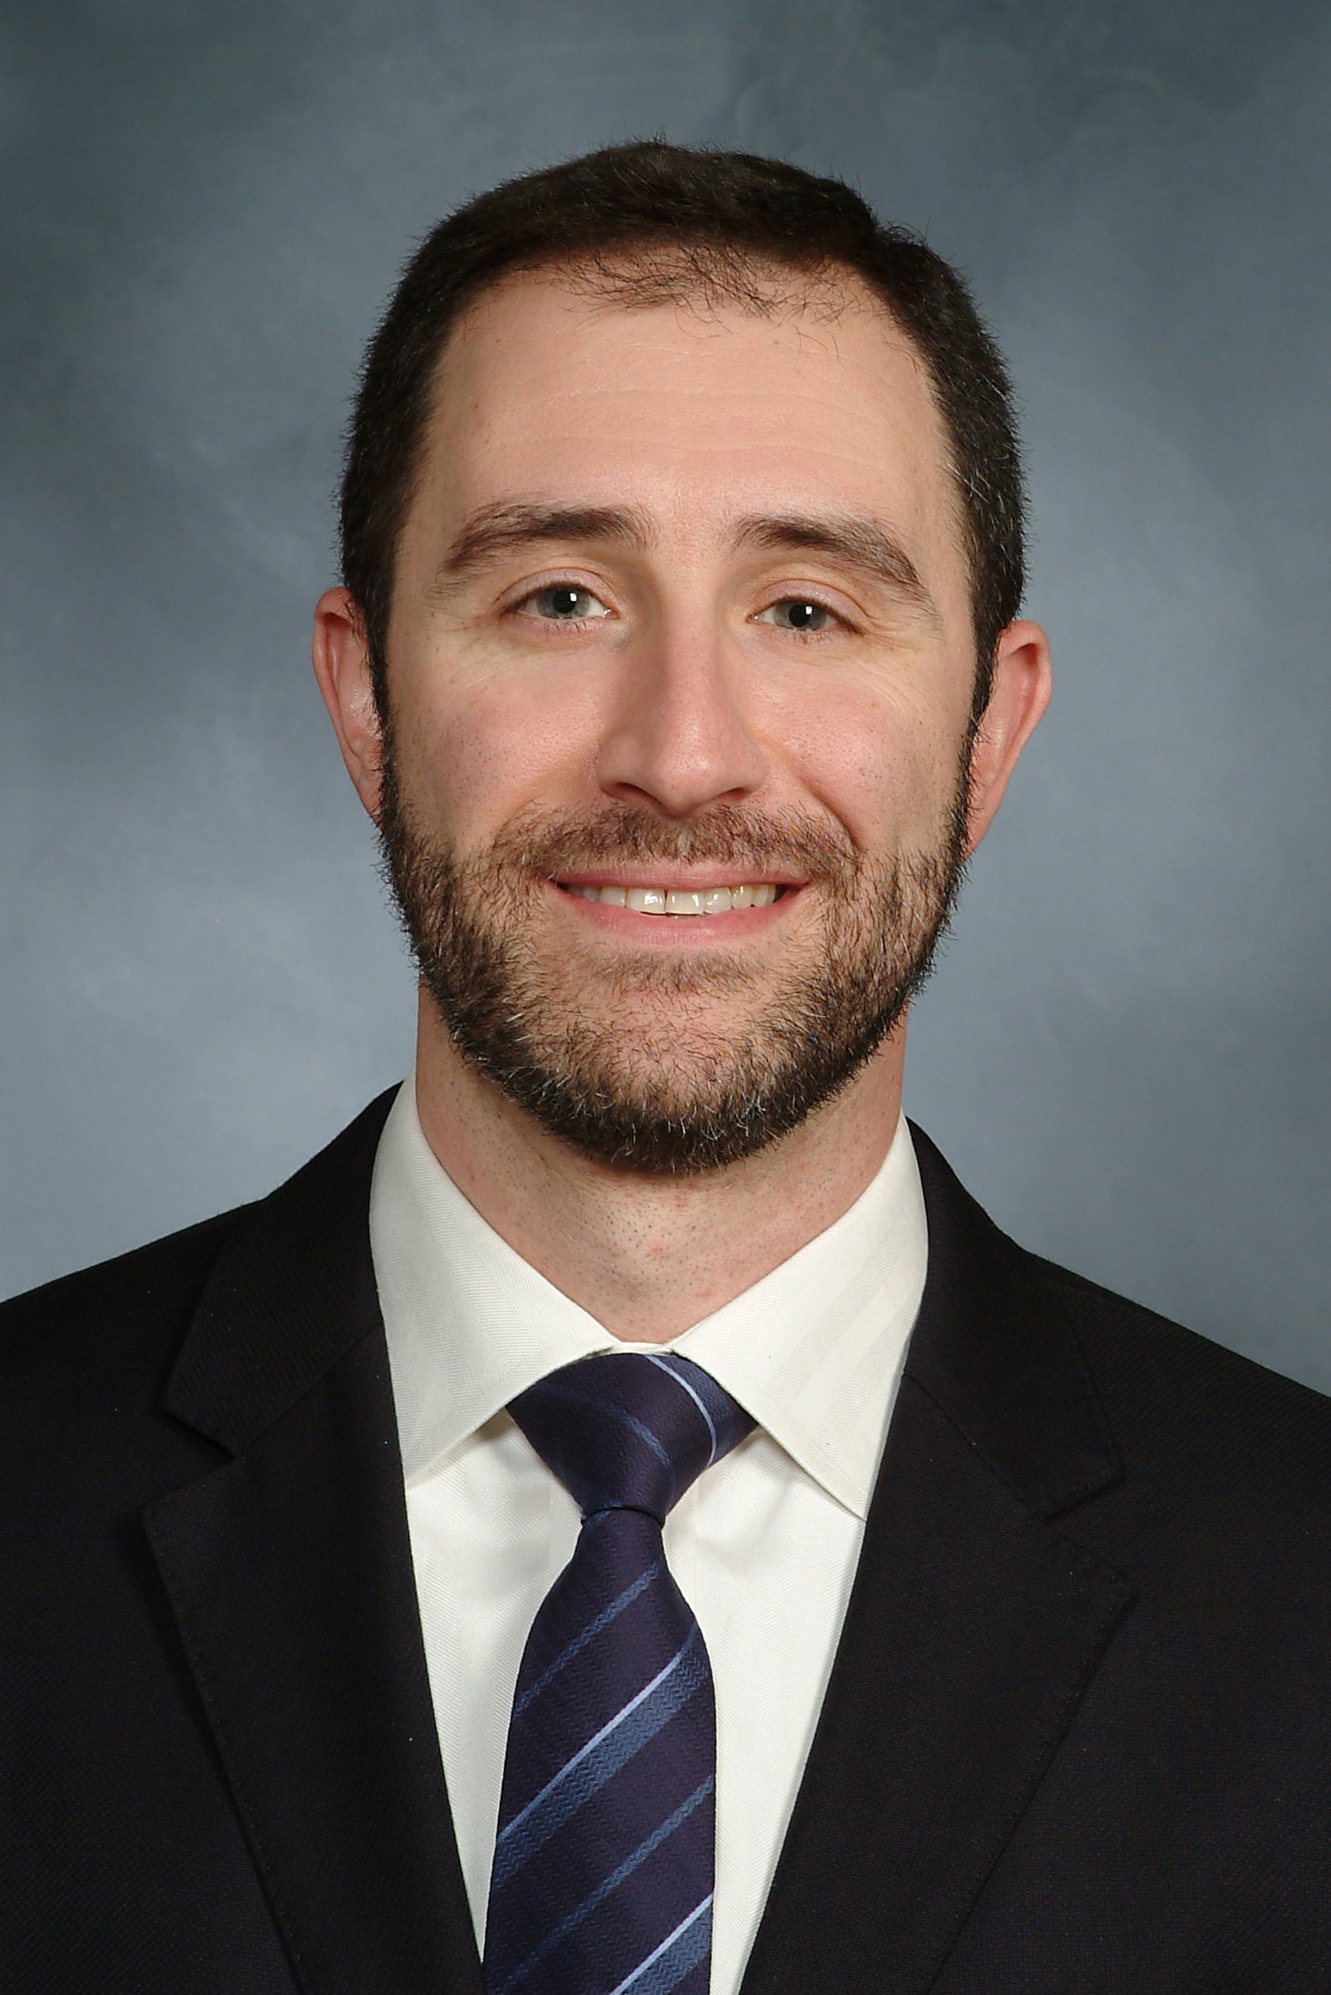 Dr. Christopher Barbieri, M.D., Ph.D | Cornell Urology